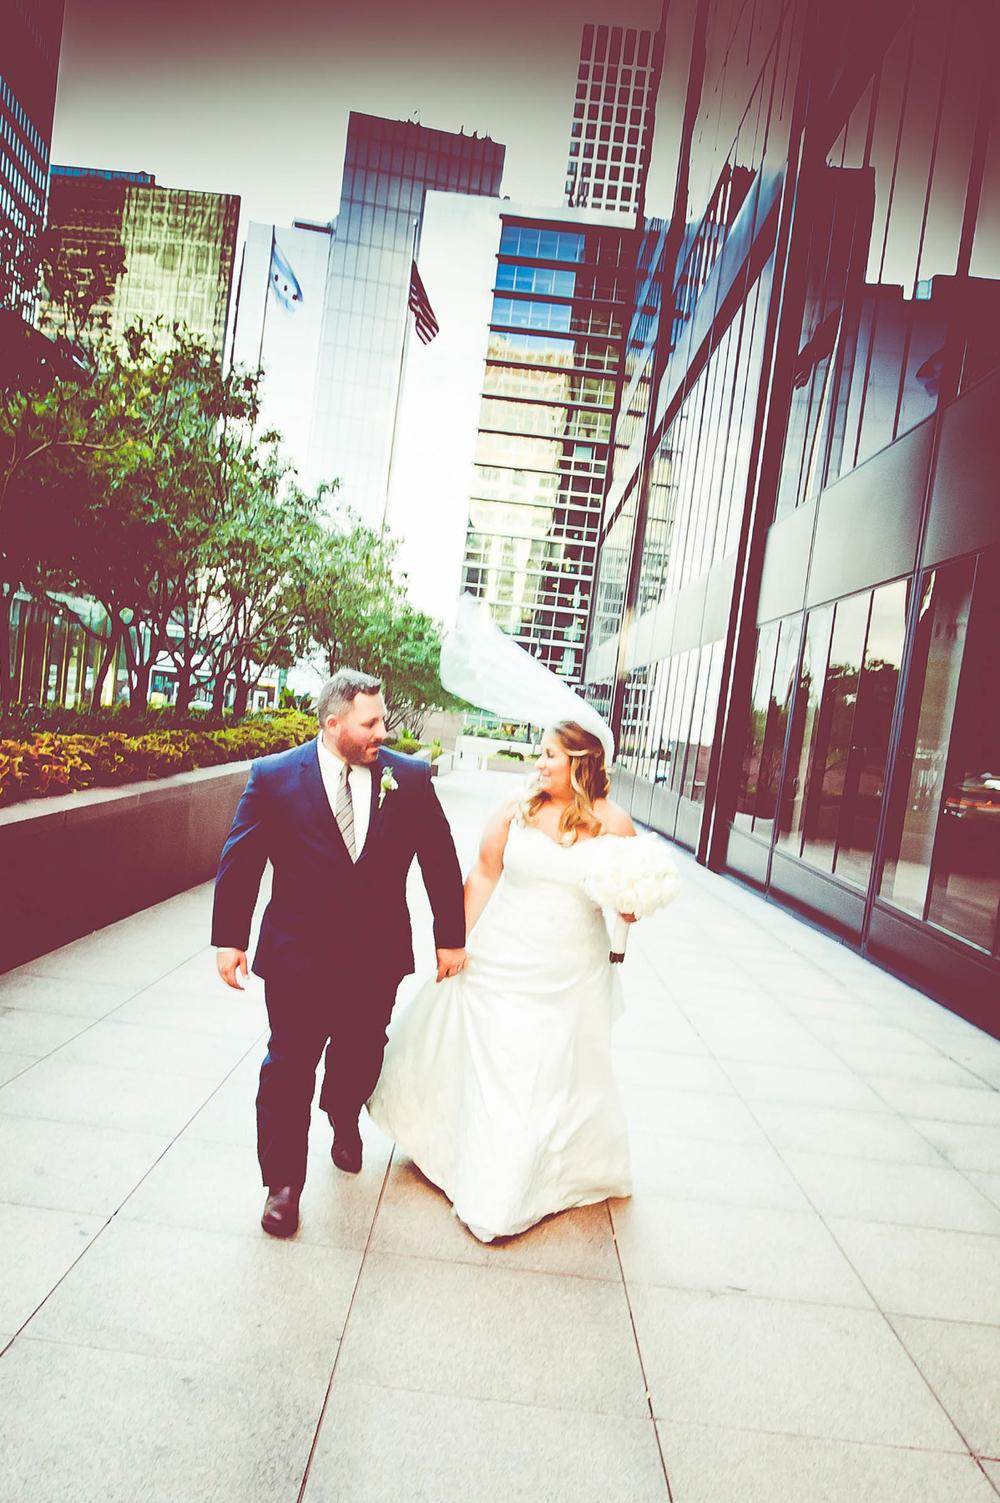 Jordan-Levy Wedding_8855-2.jpg